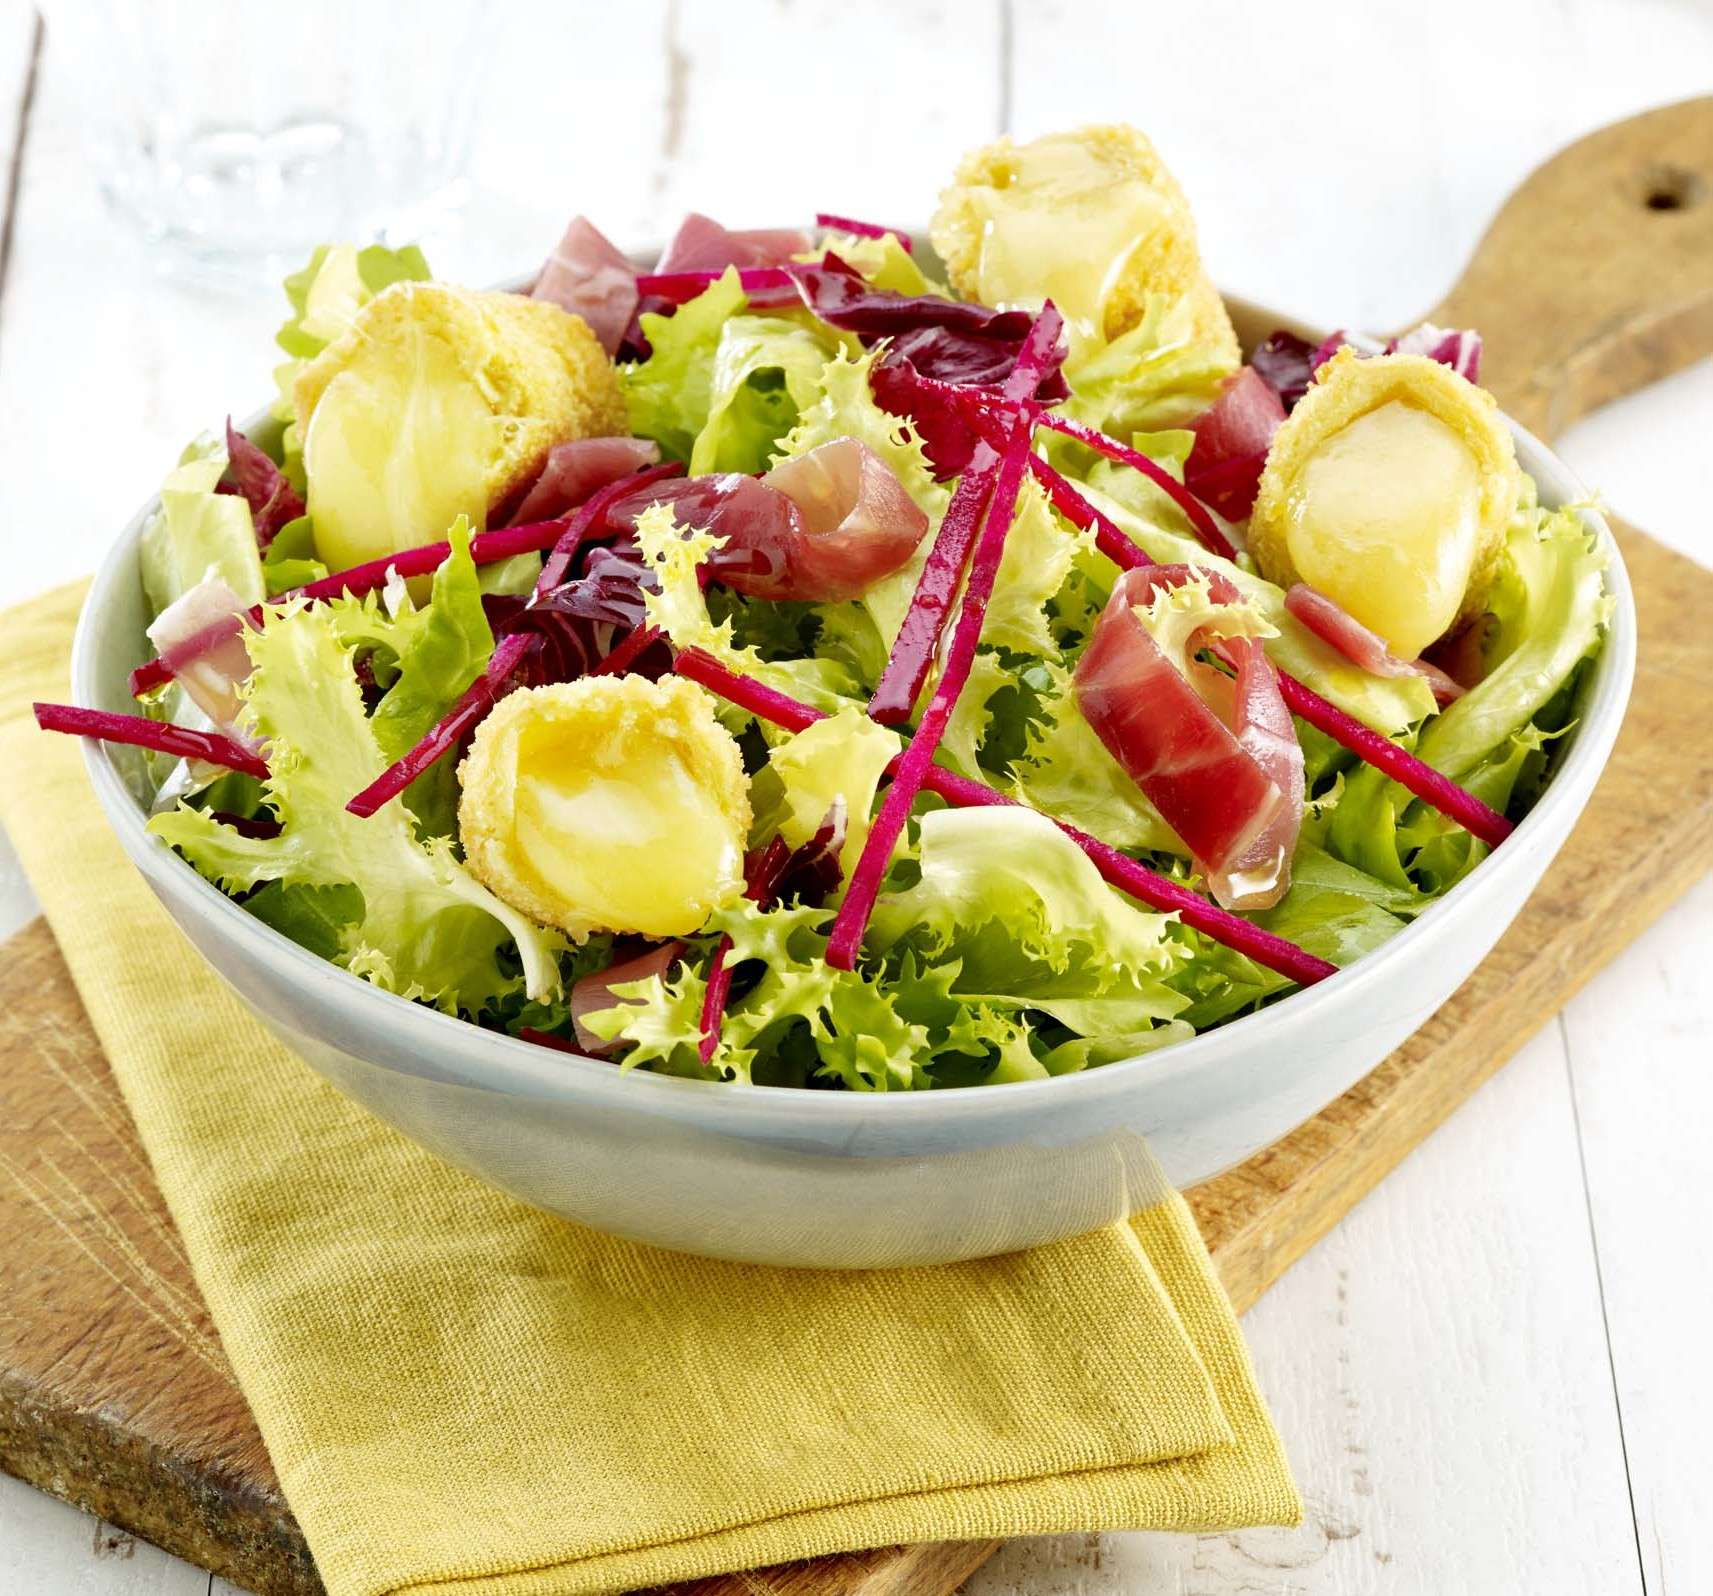 salade-baujue-site-web-29